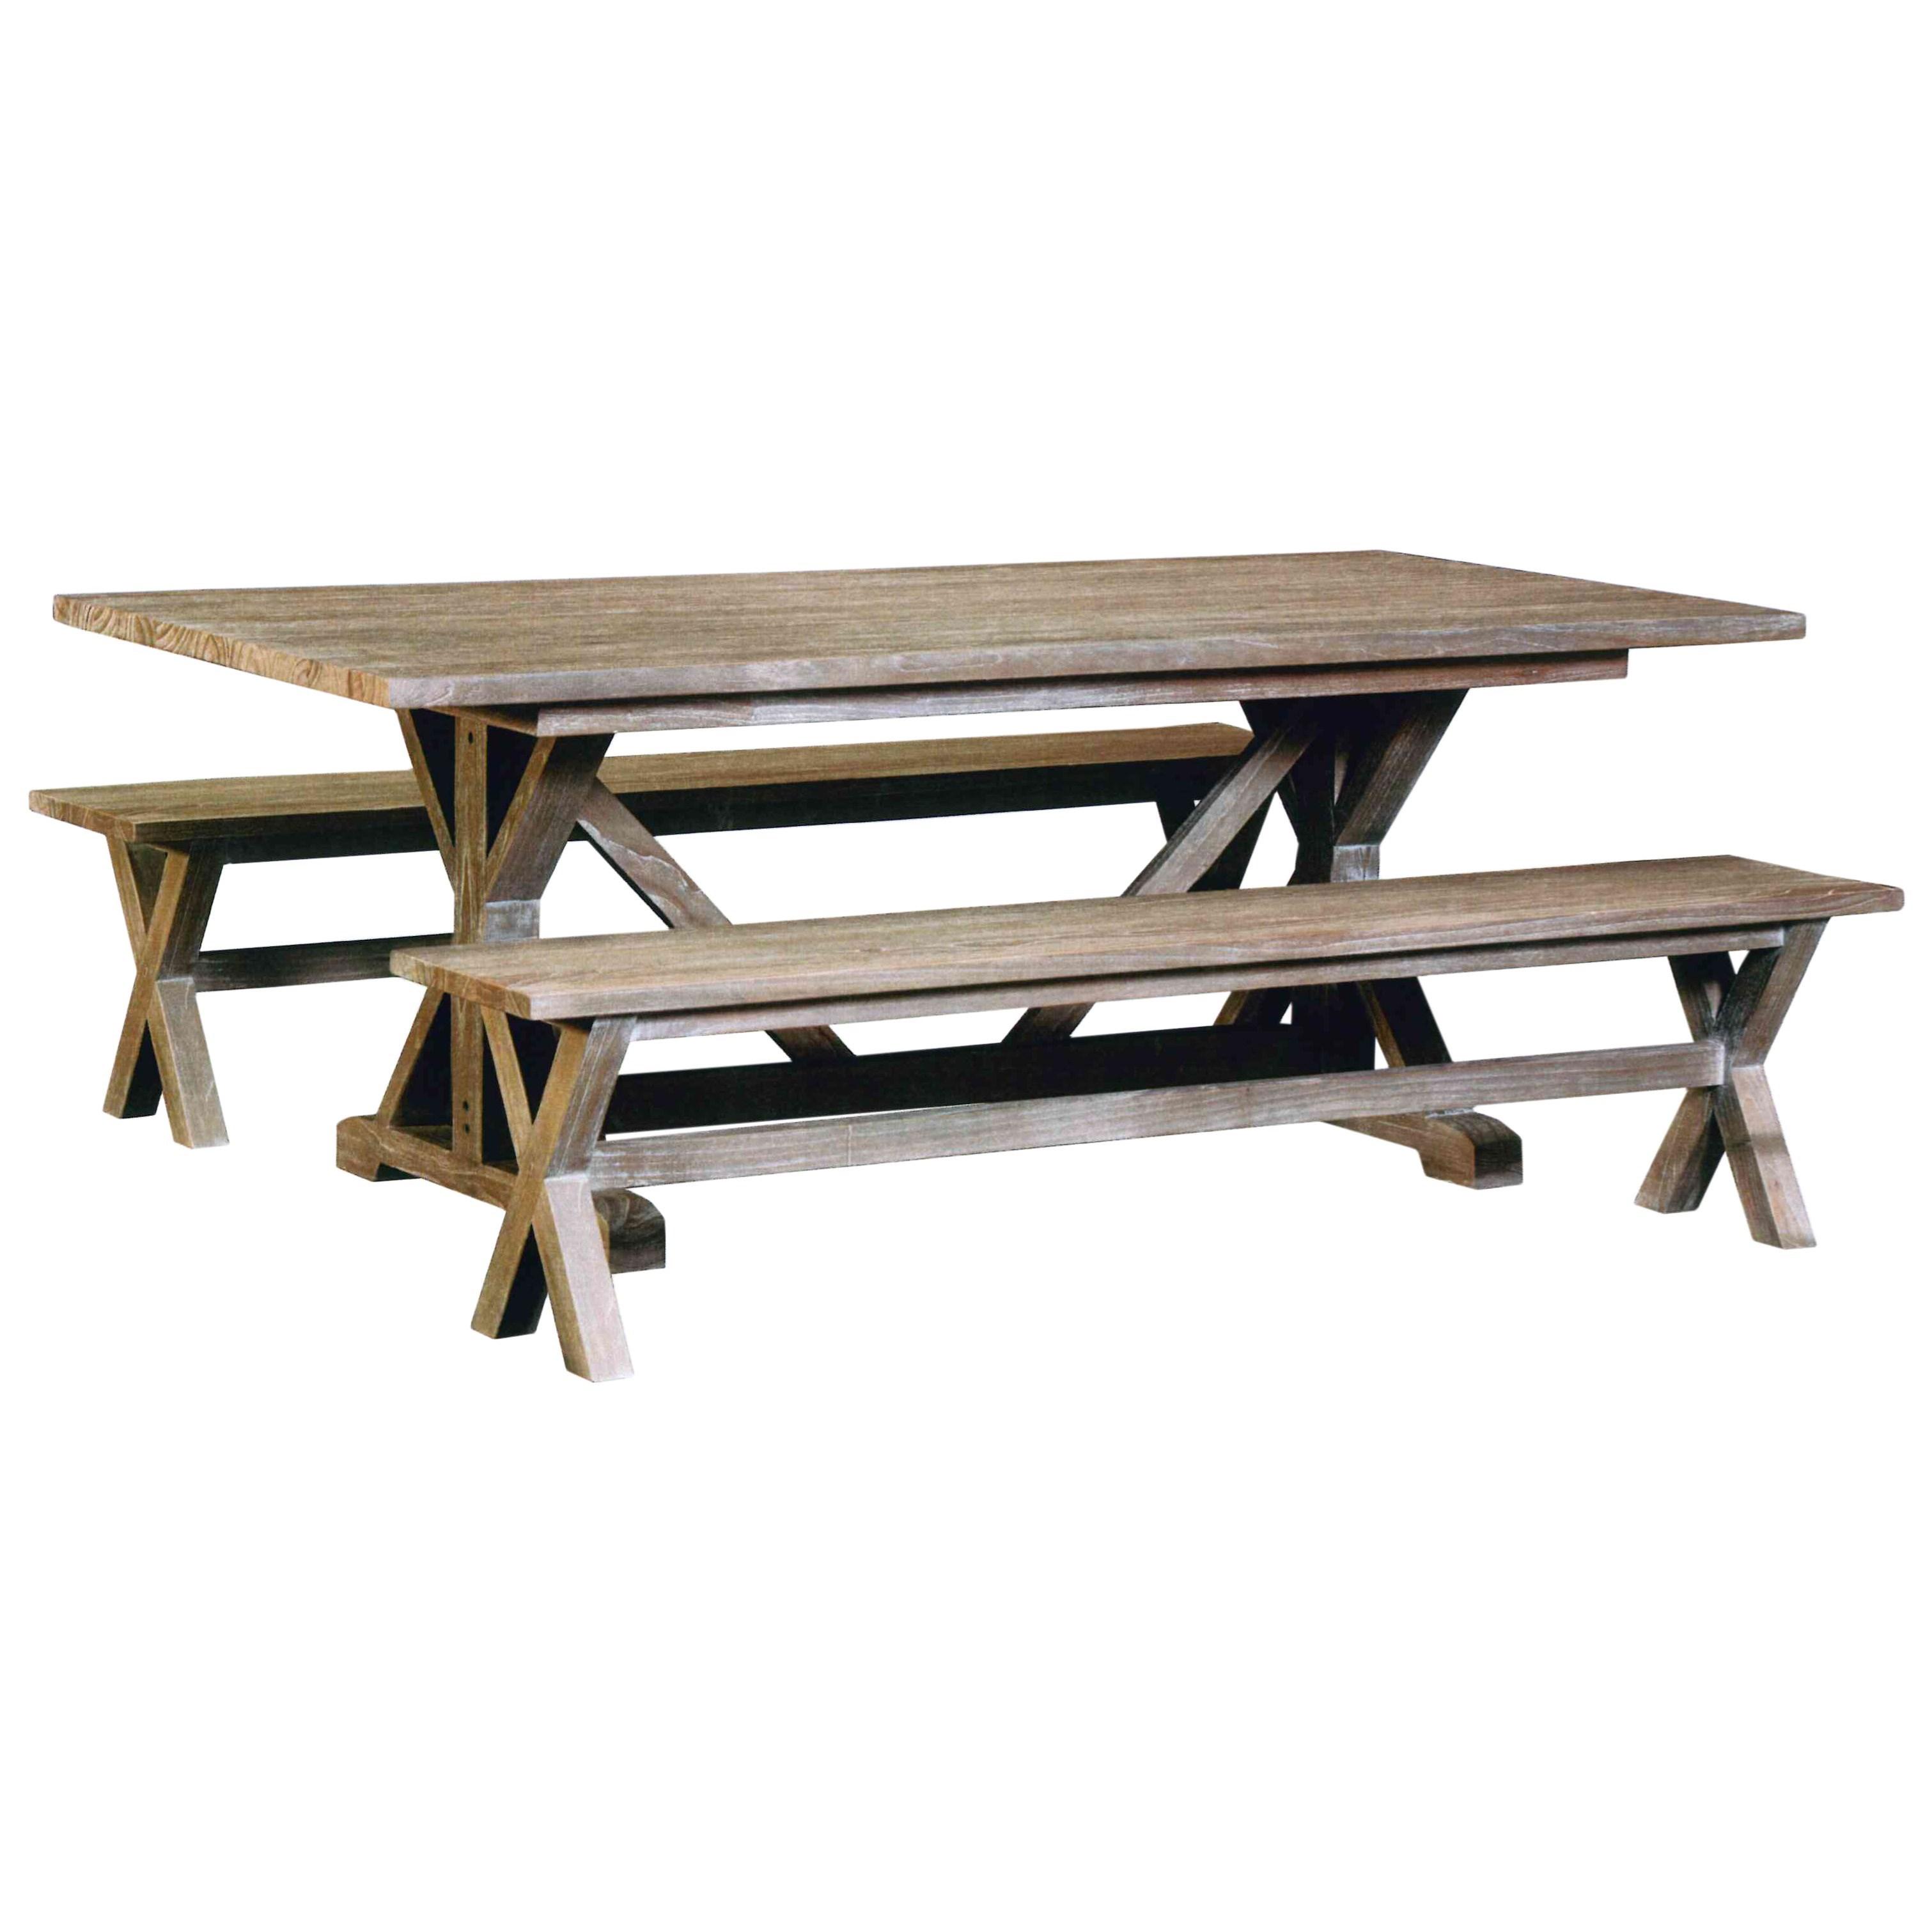 Capris Furniture 766 Rustic Coastal Three Piece Bench Dining Set   Hudsonu0027s  Furniture   Dining 3 Piece Sets